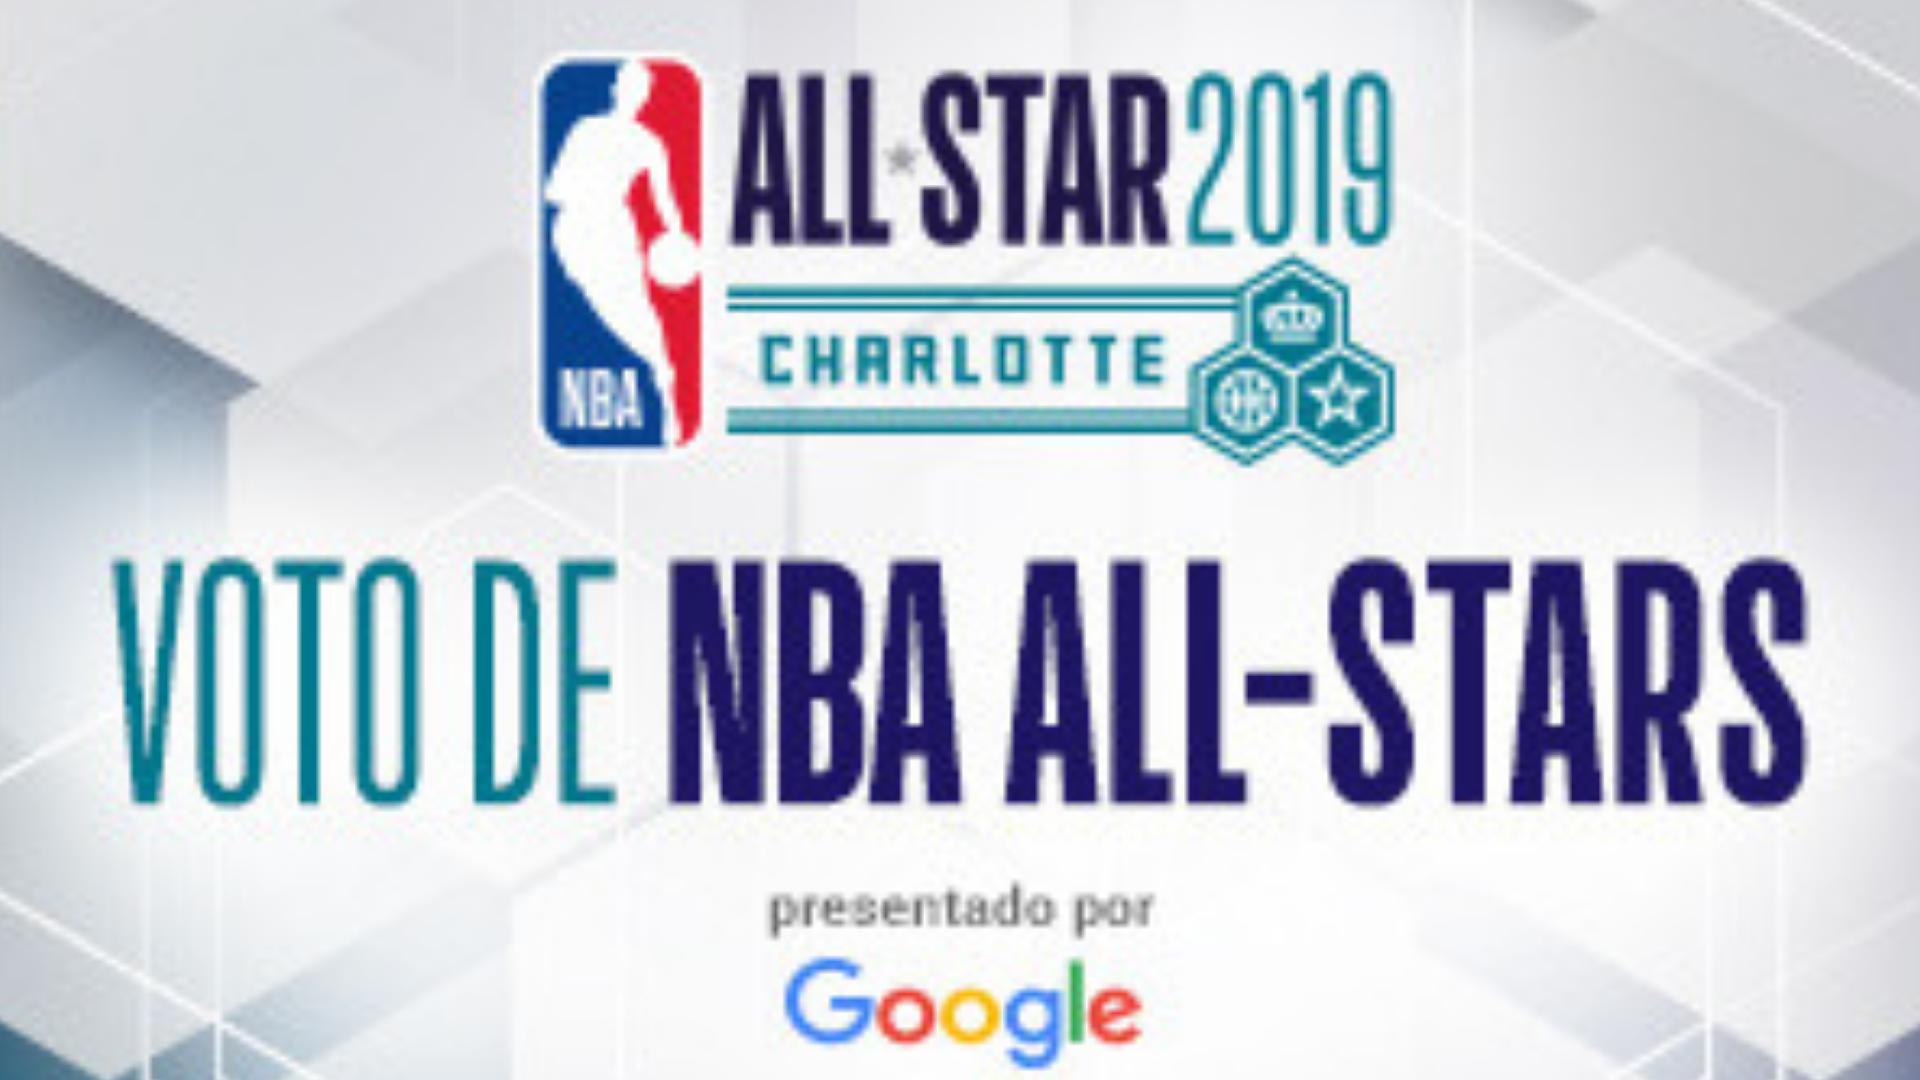 Nba All Star 2019 Votar